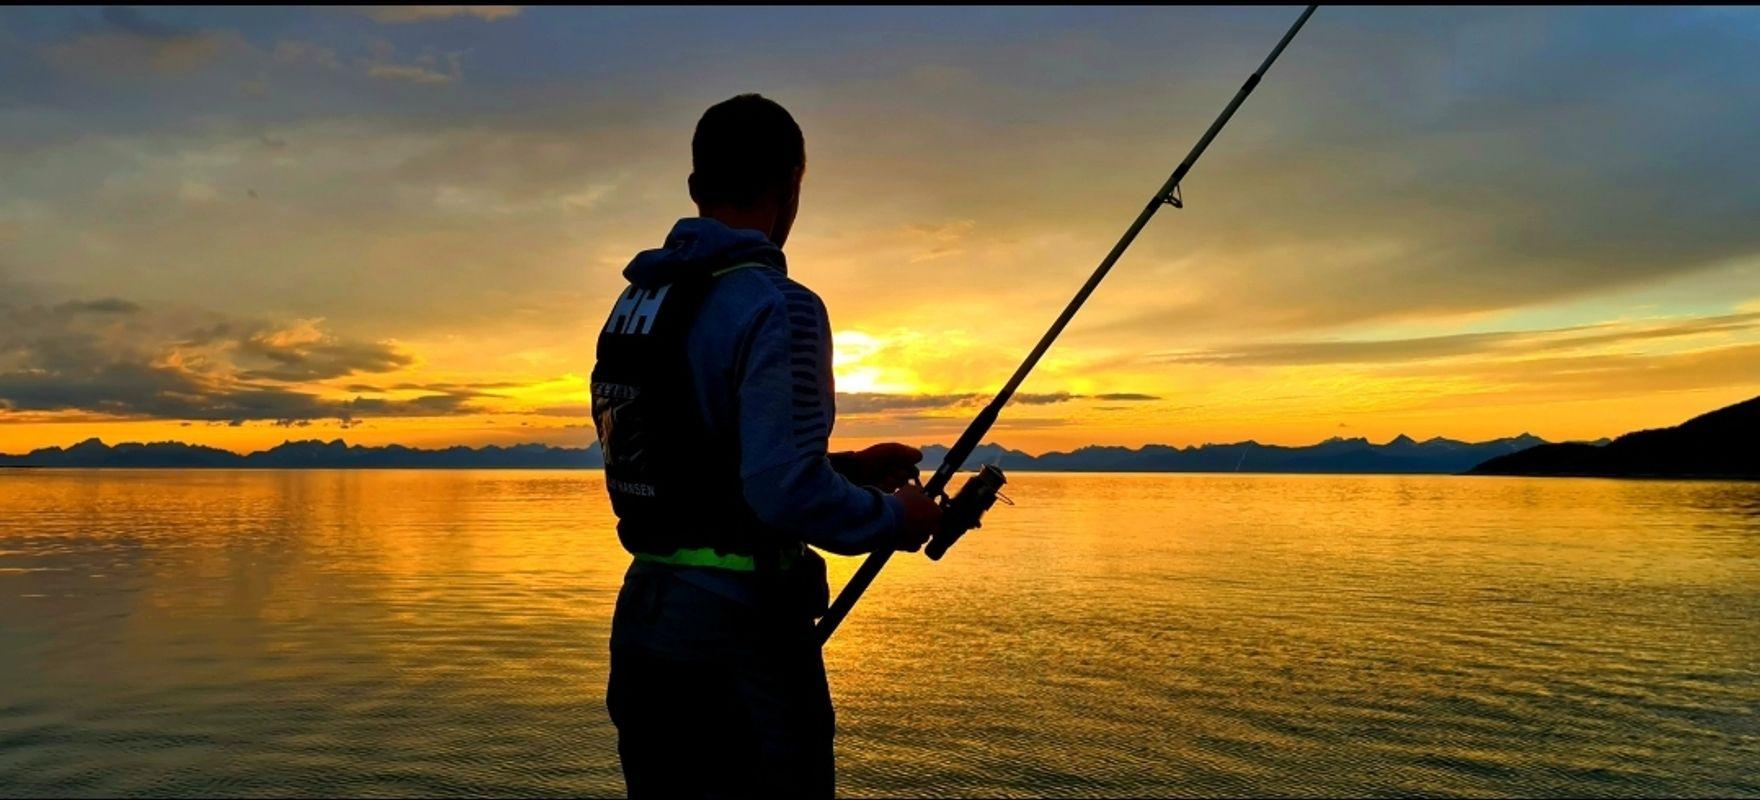 Midnight sun fisher